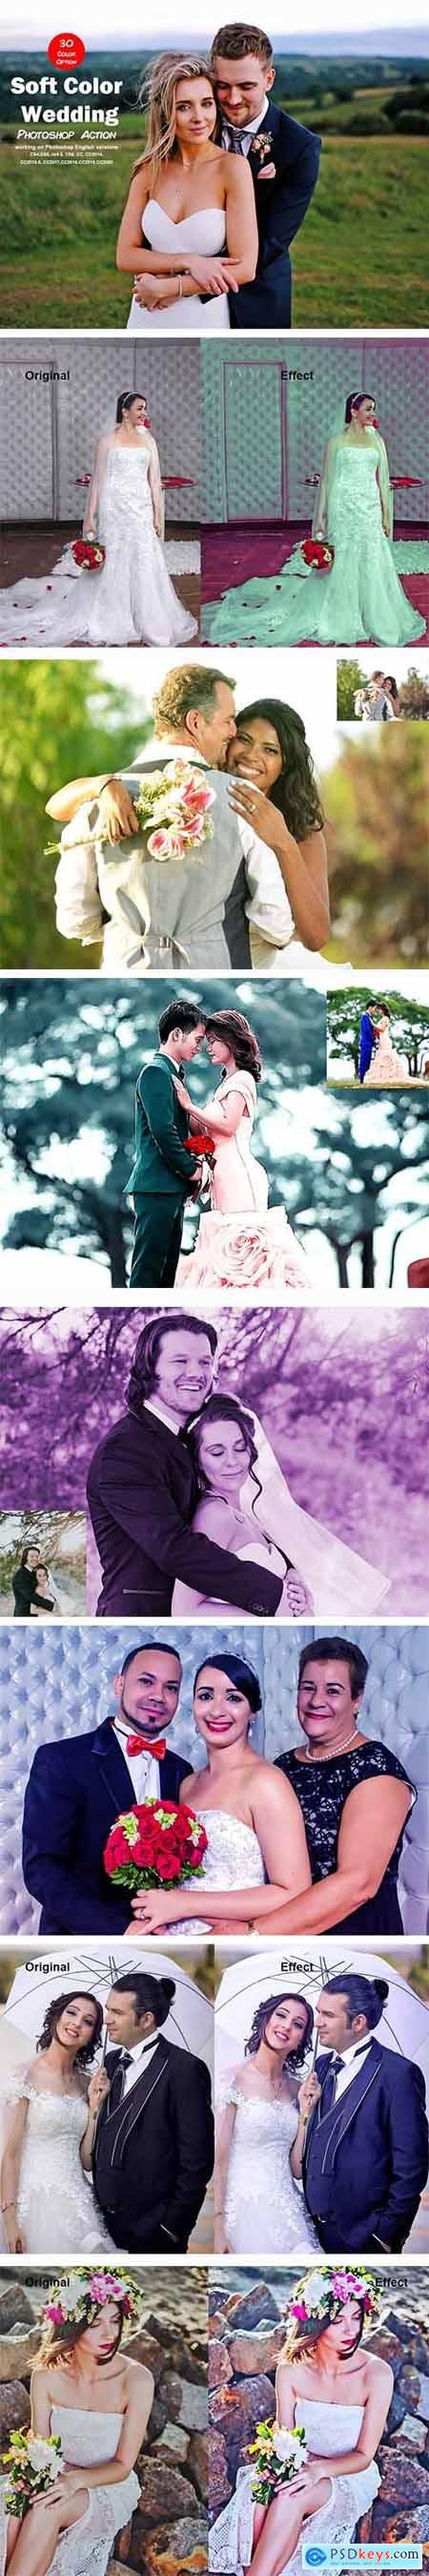 Soft Color Wedding Photoshop Action 5529582